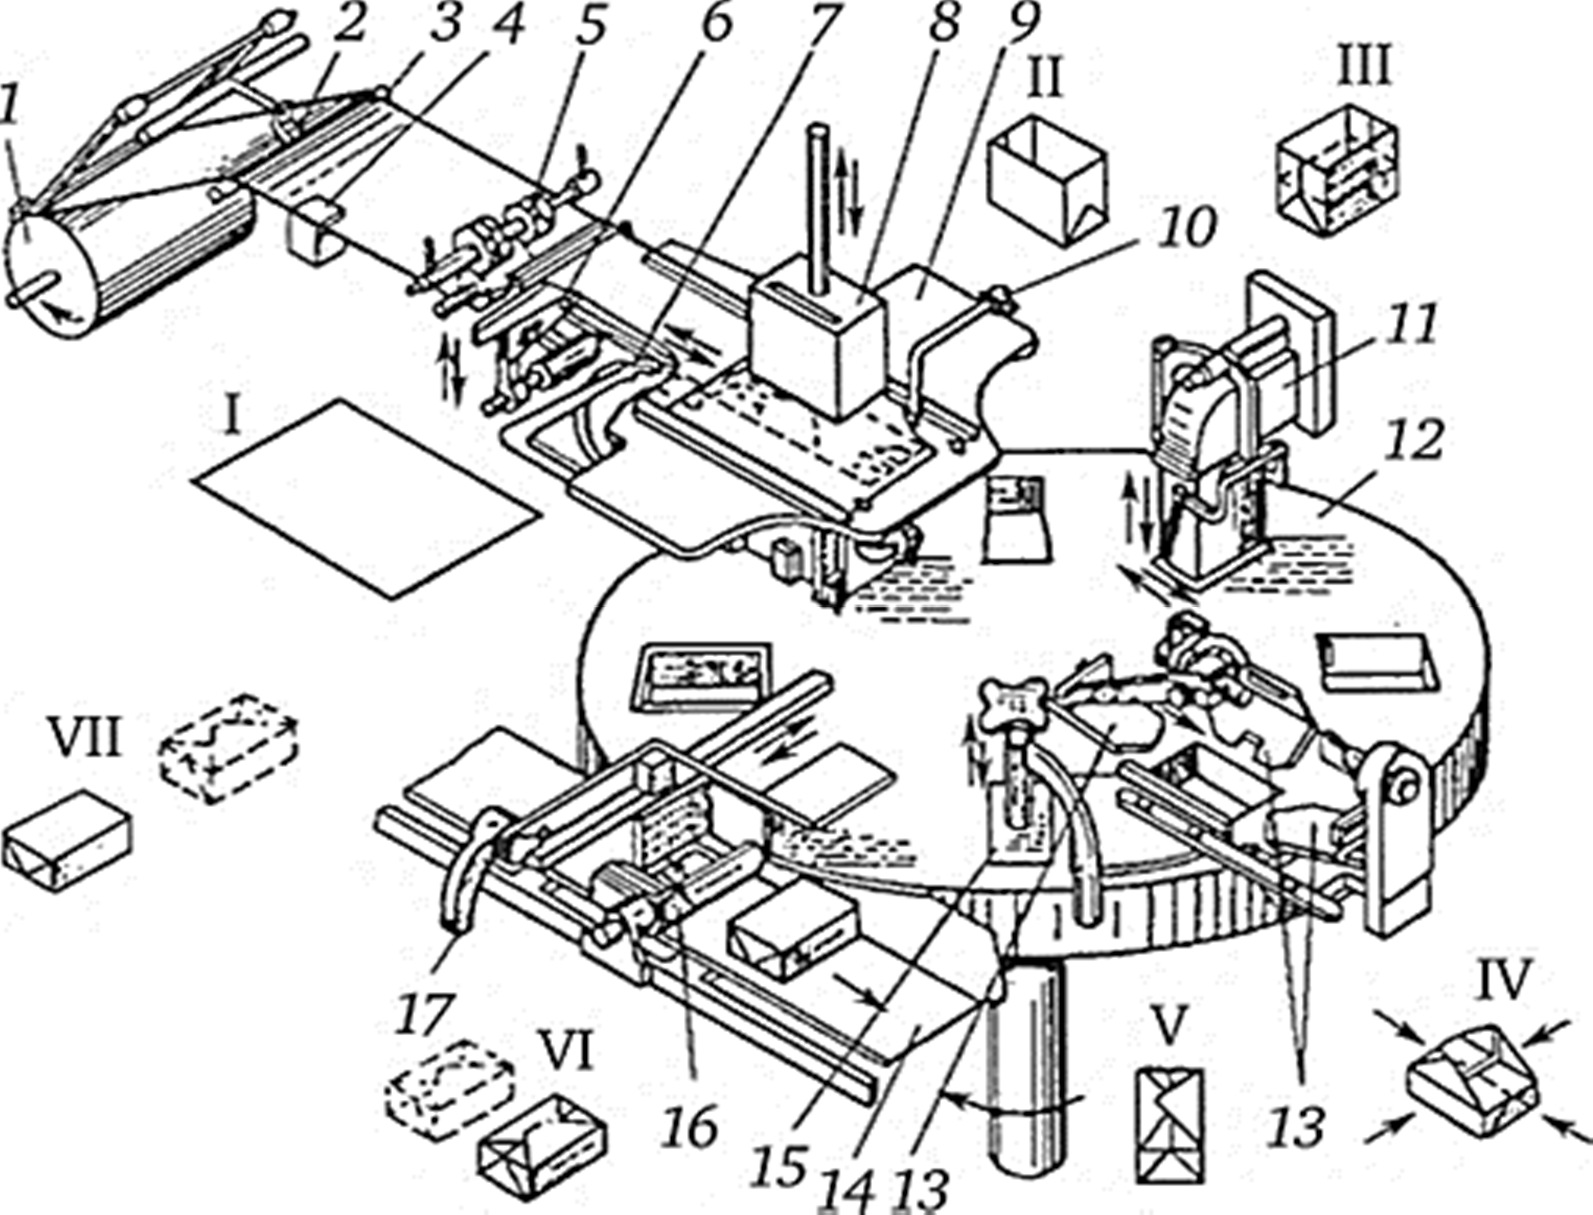 Схема фасовочно-упаковочного автомата АРМ